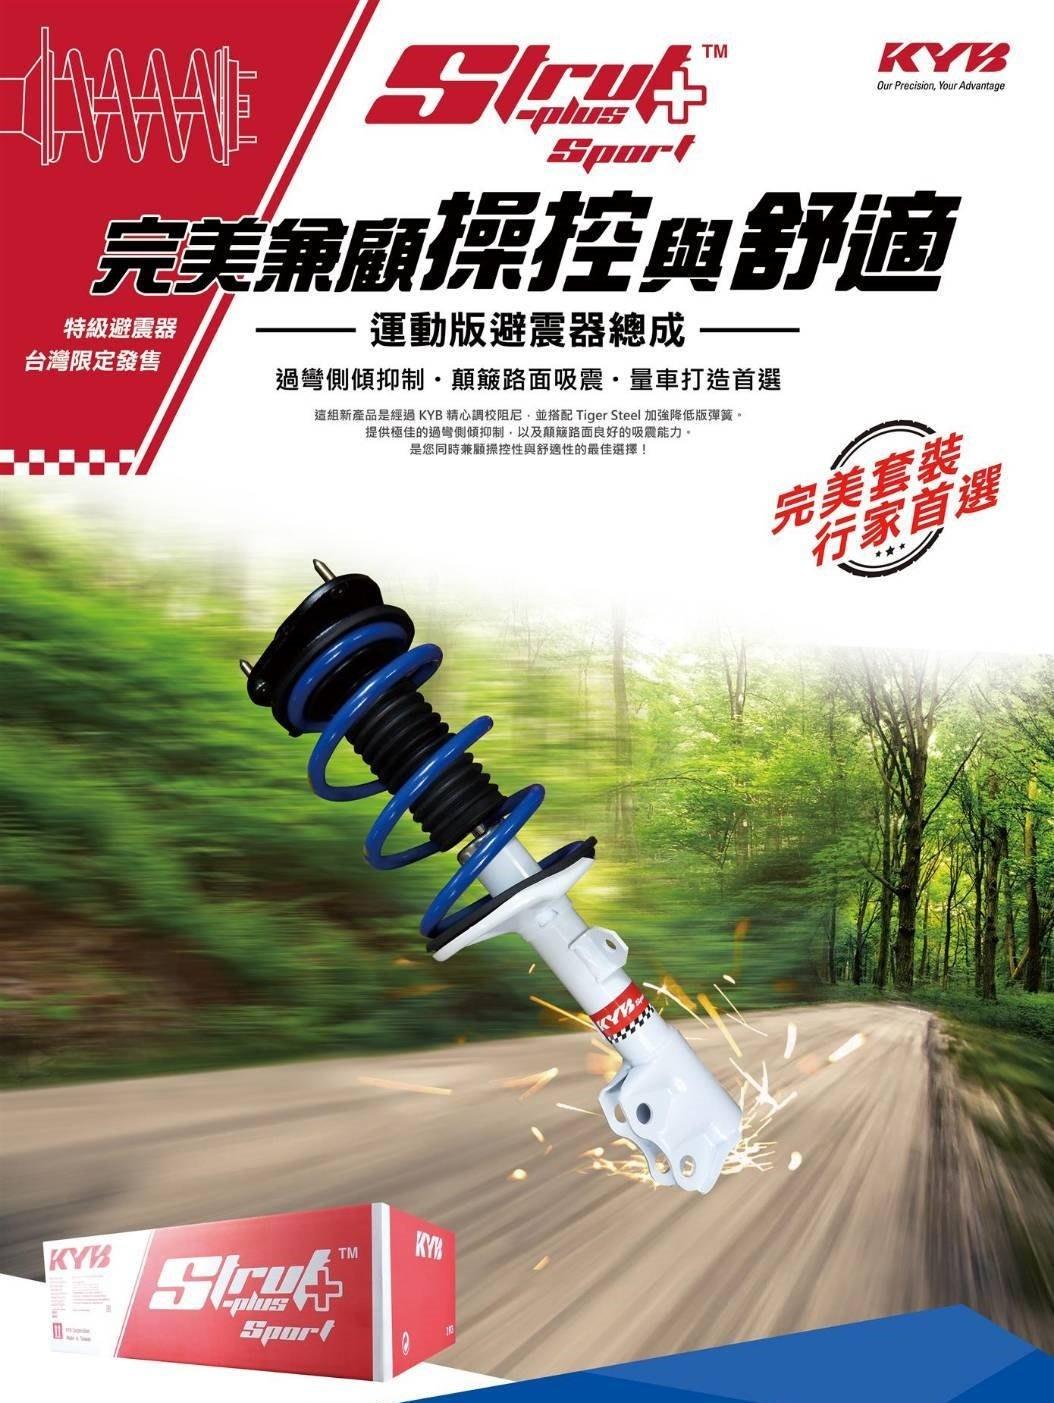 +OMG車坊+09- NEW WISH KYB 白桶避震器降低總成 Strut Plus Sport 白筒